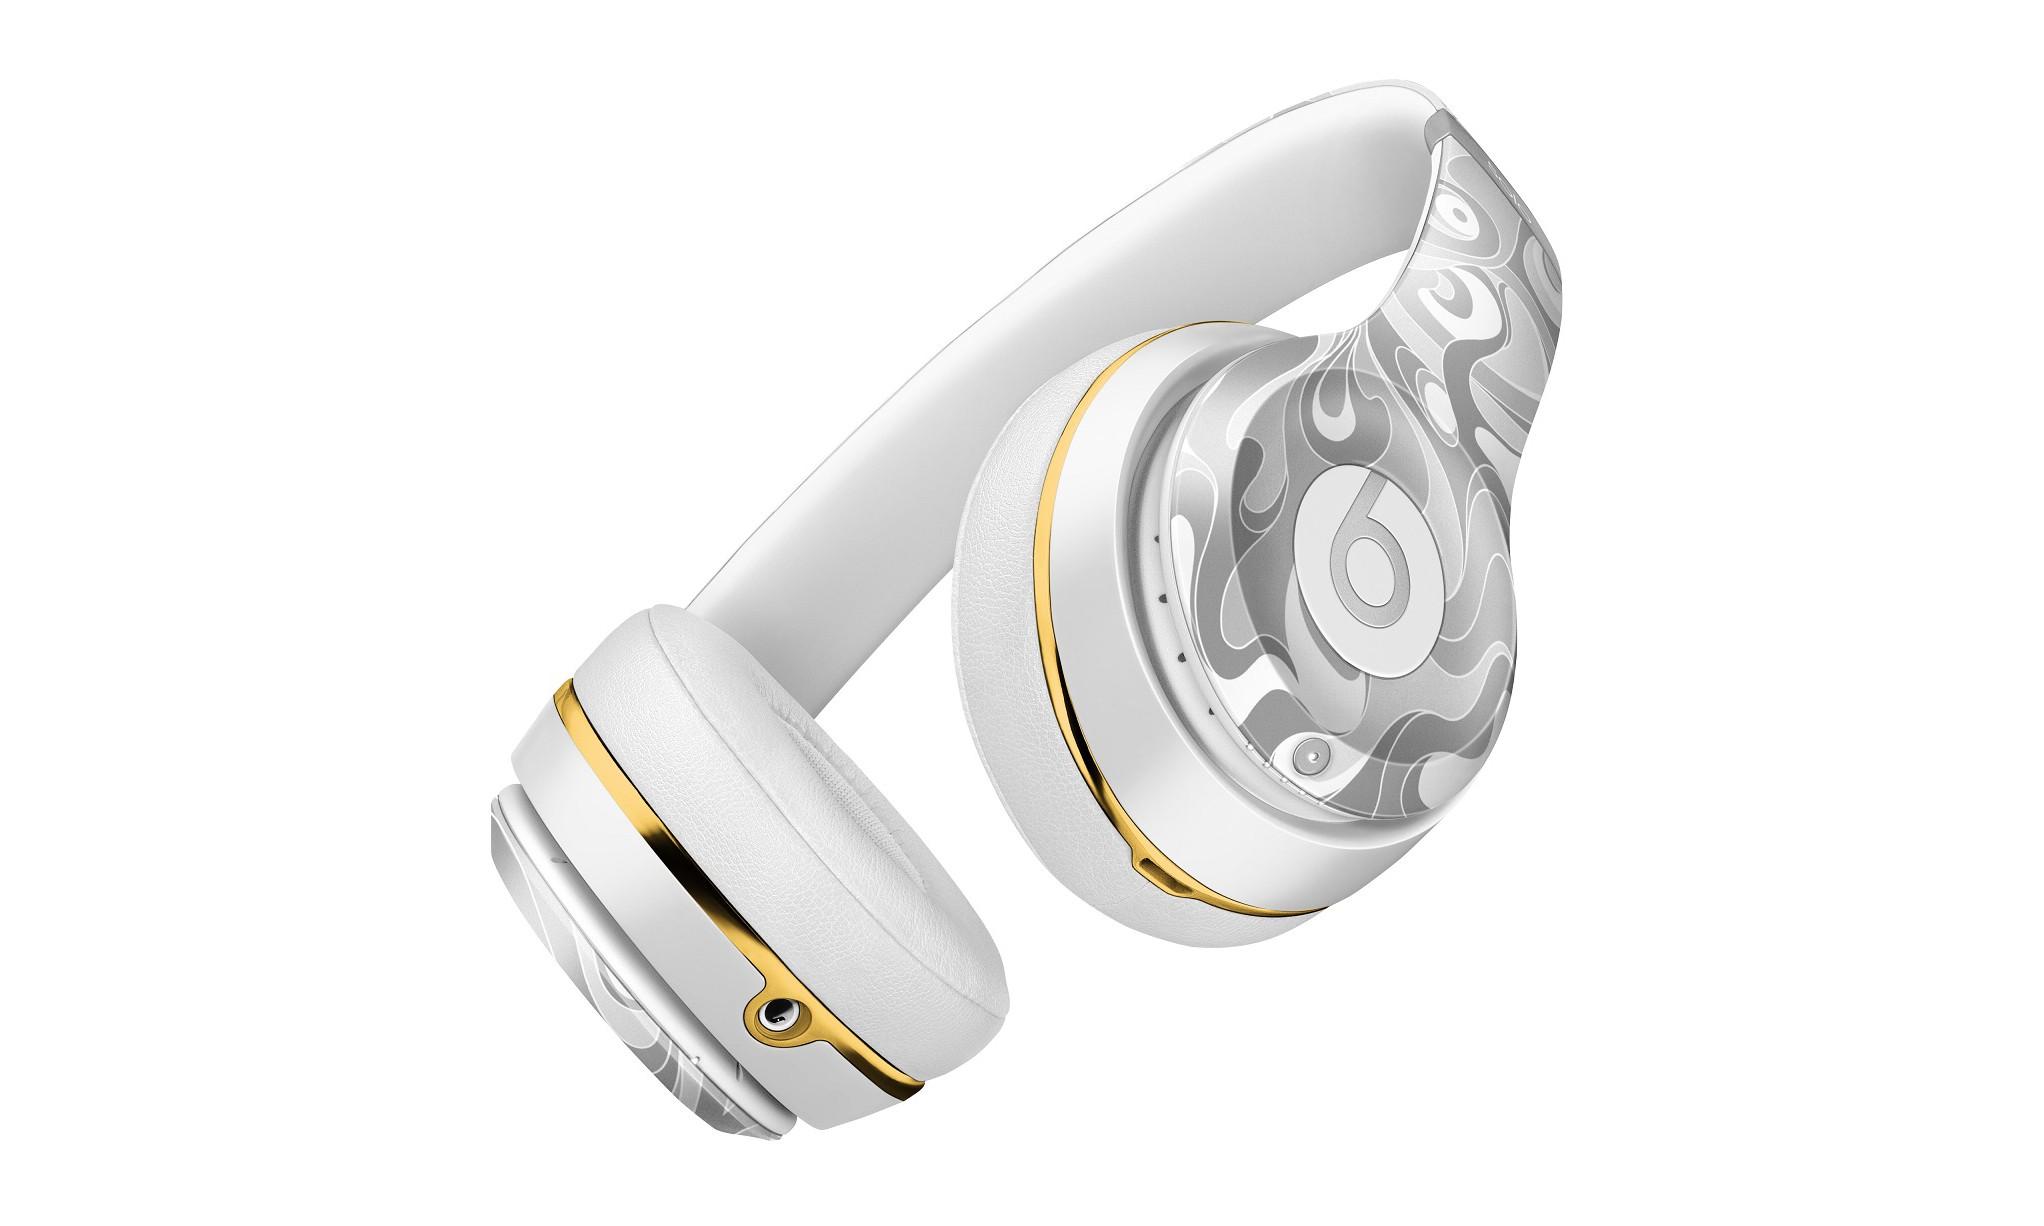 Beats by Dr. Dre 携手知名 视觉艺术家 James Jean 推出猴年特别限定 Solo² Wireless